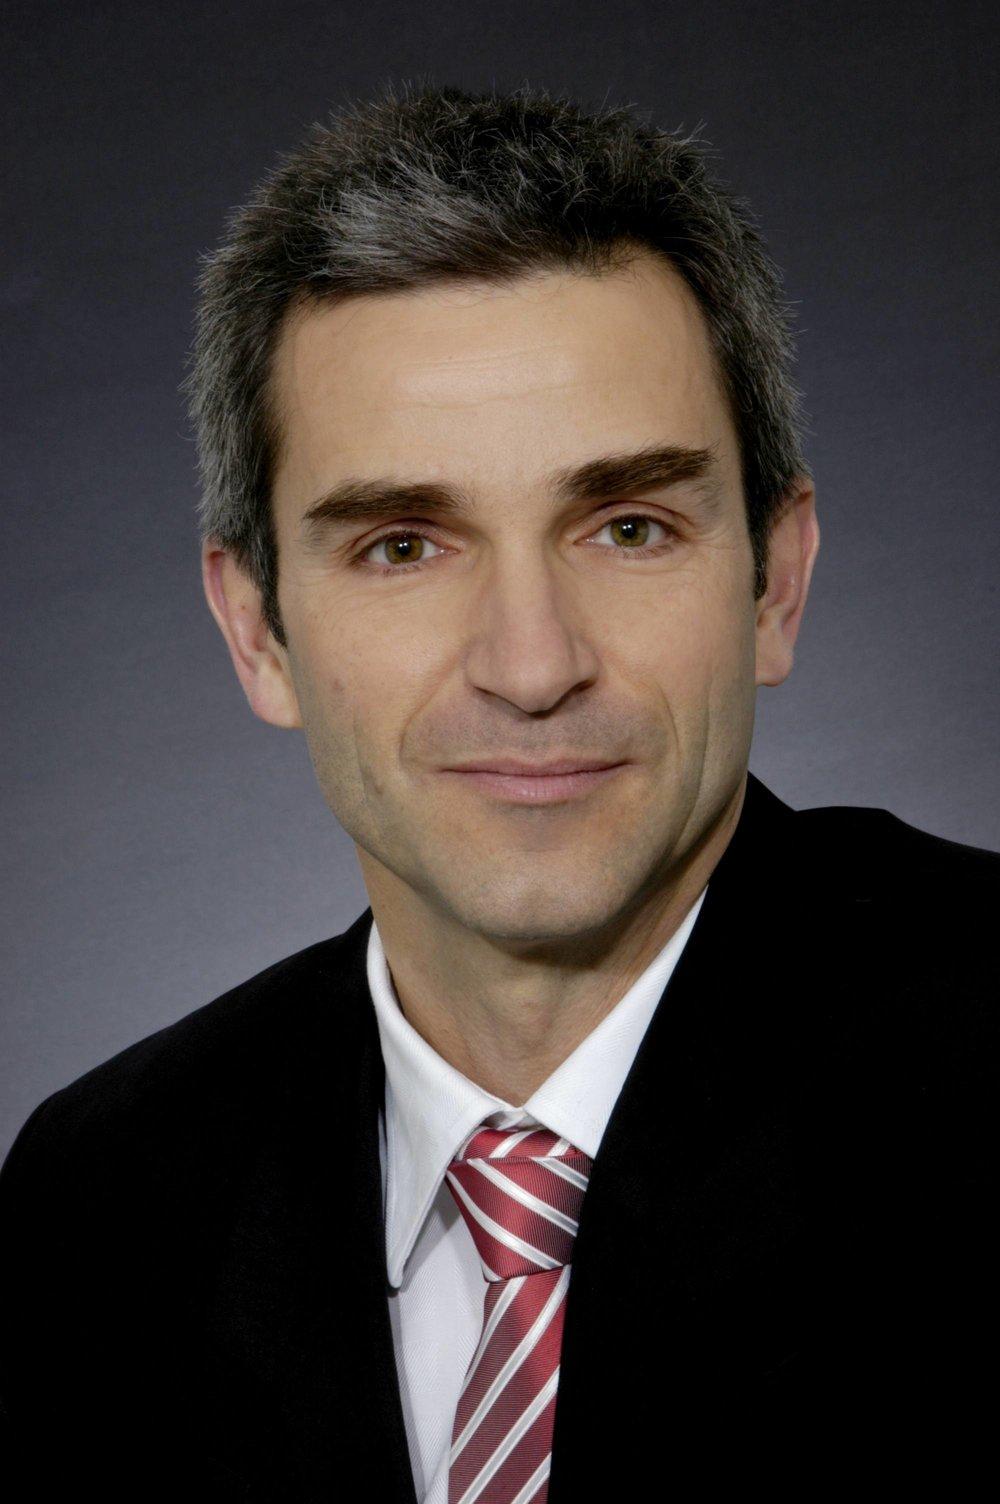 Ferdinand Schnitker, Bayer AG